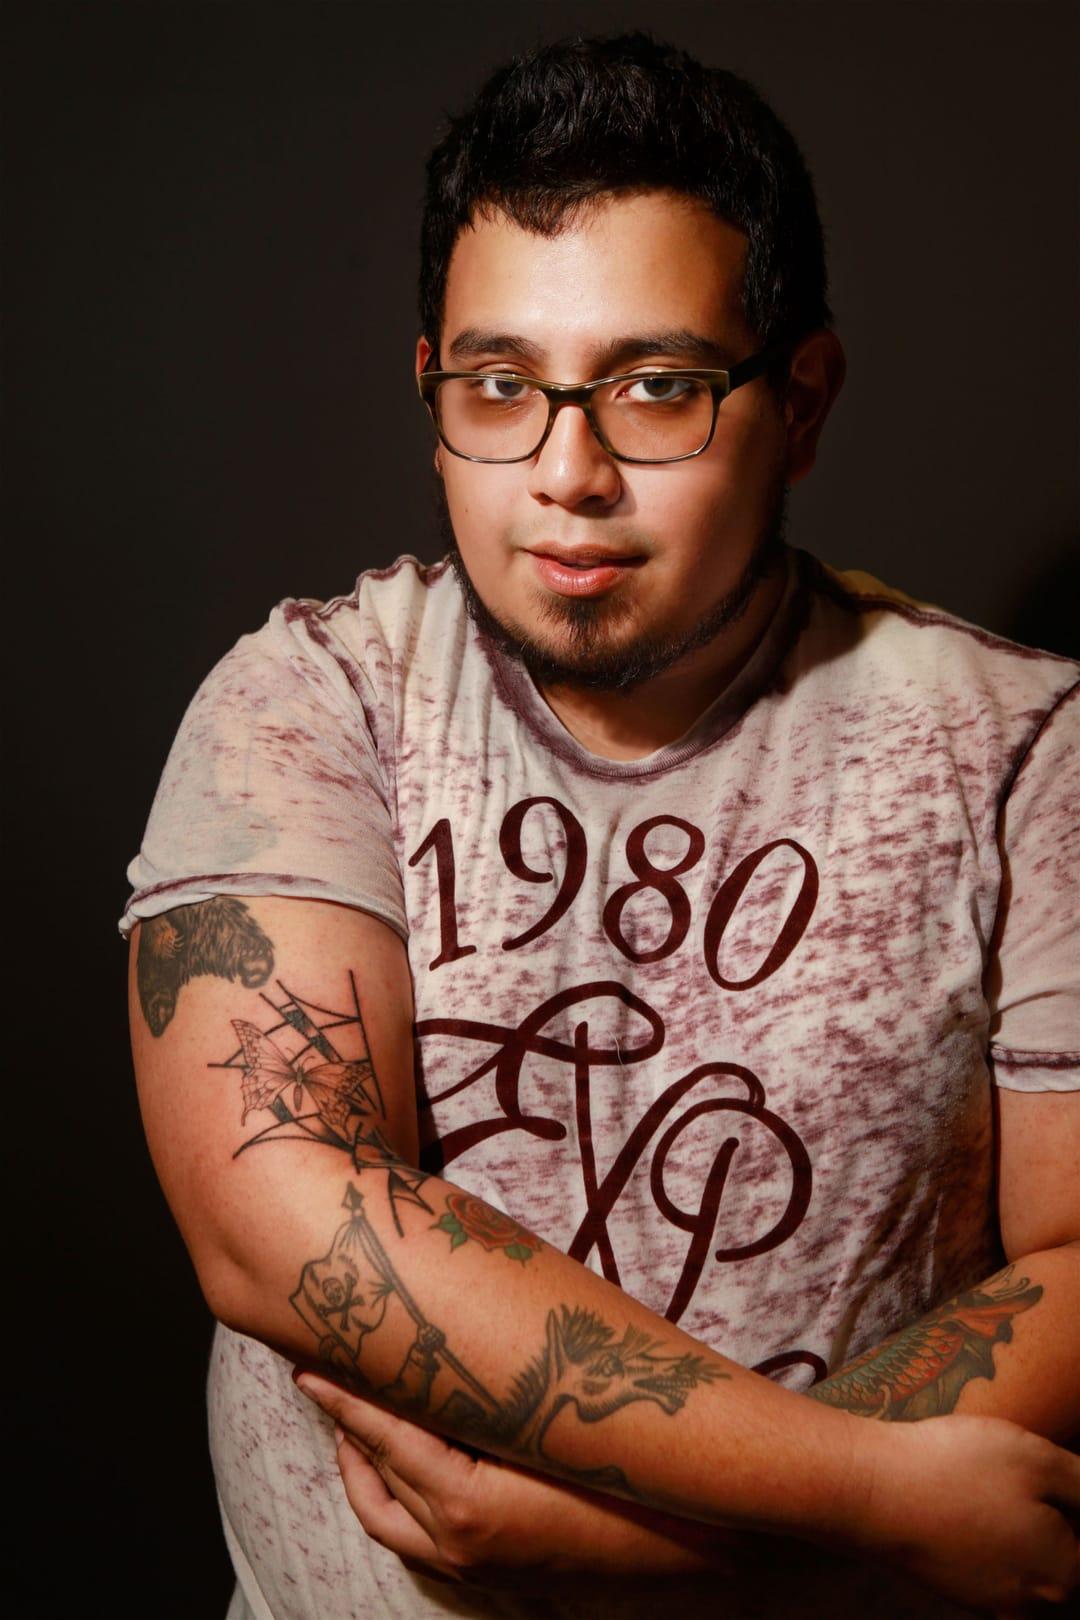 Oscar Portillo, photo by Marisha Camp